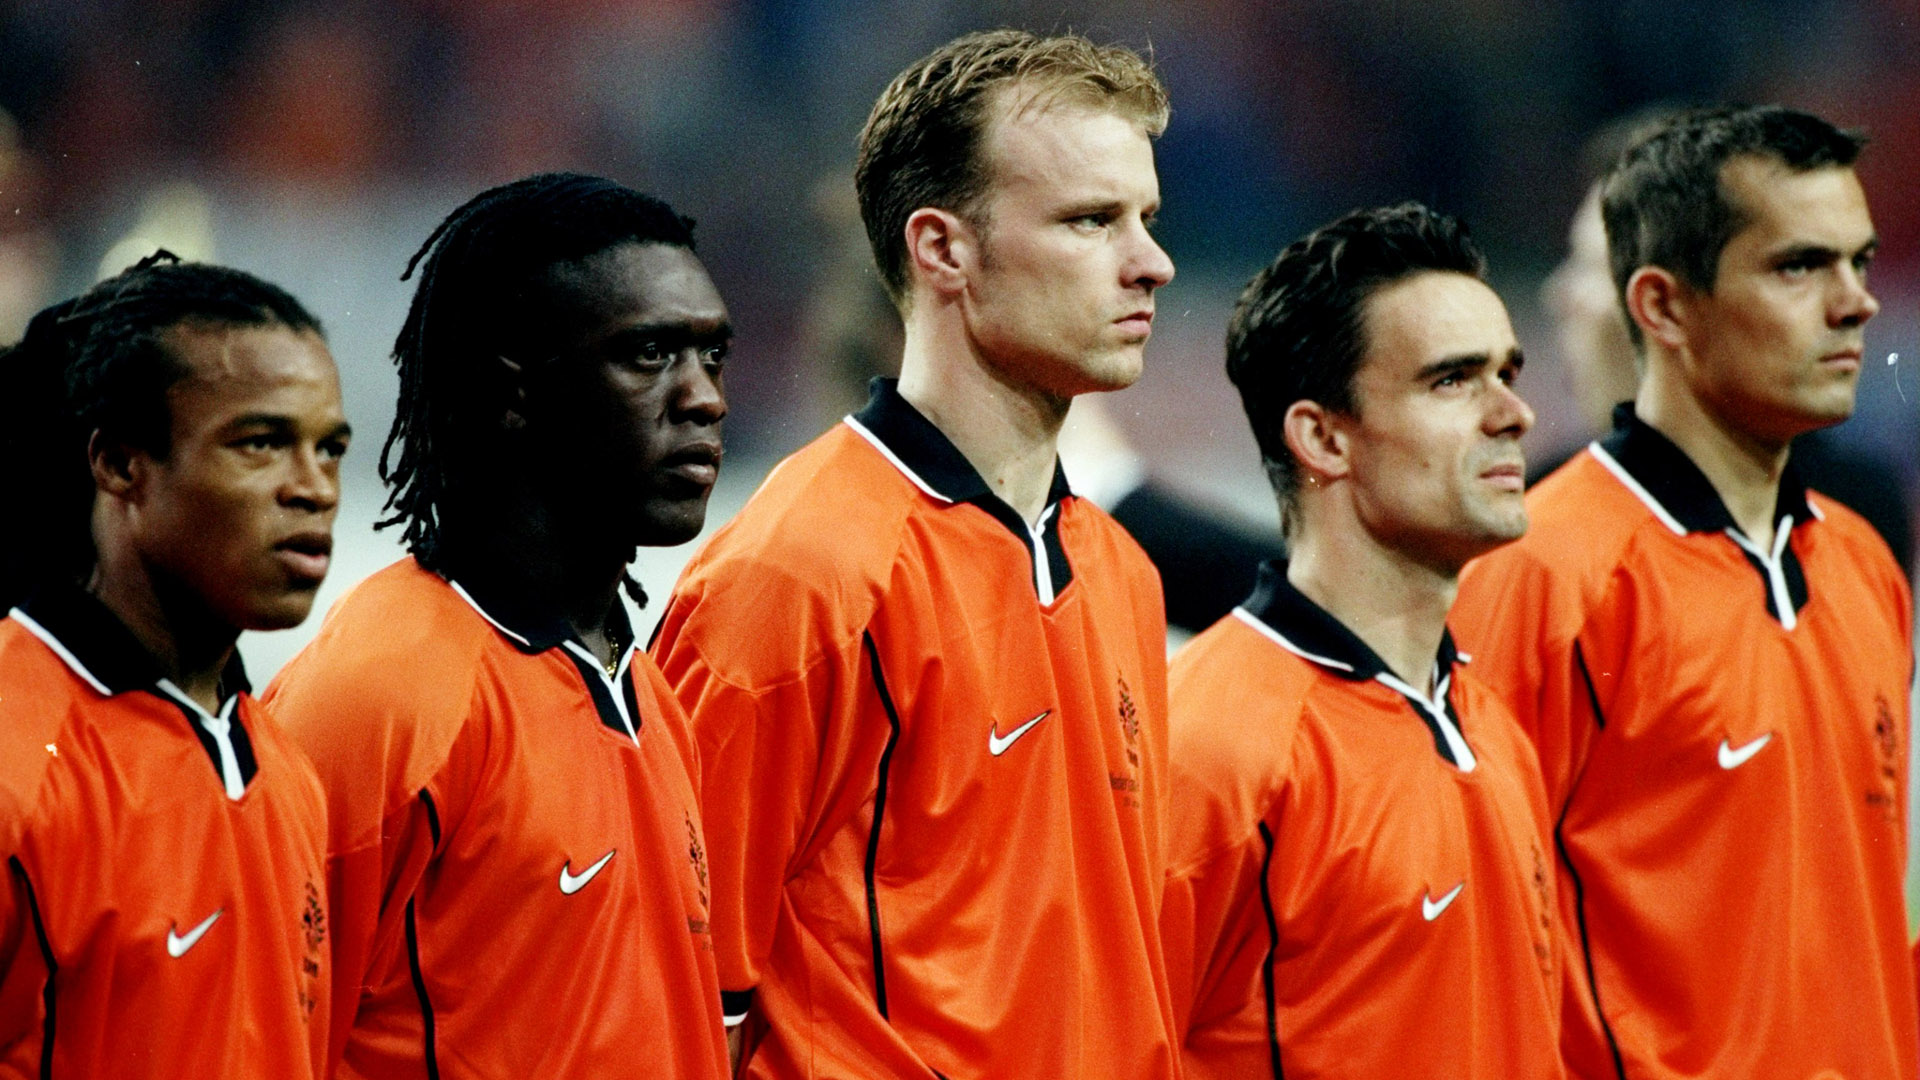 Netherlands team